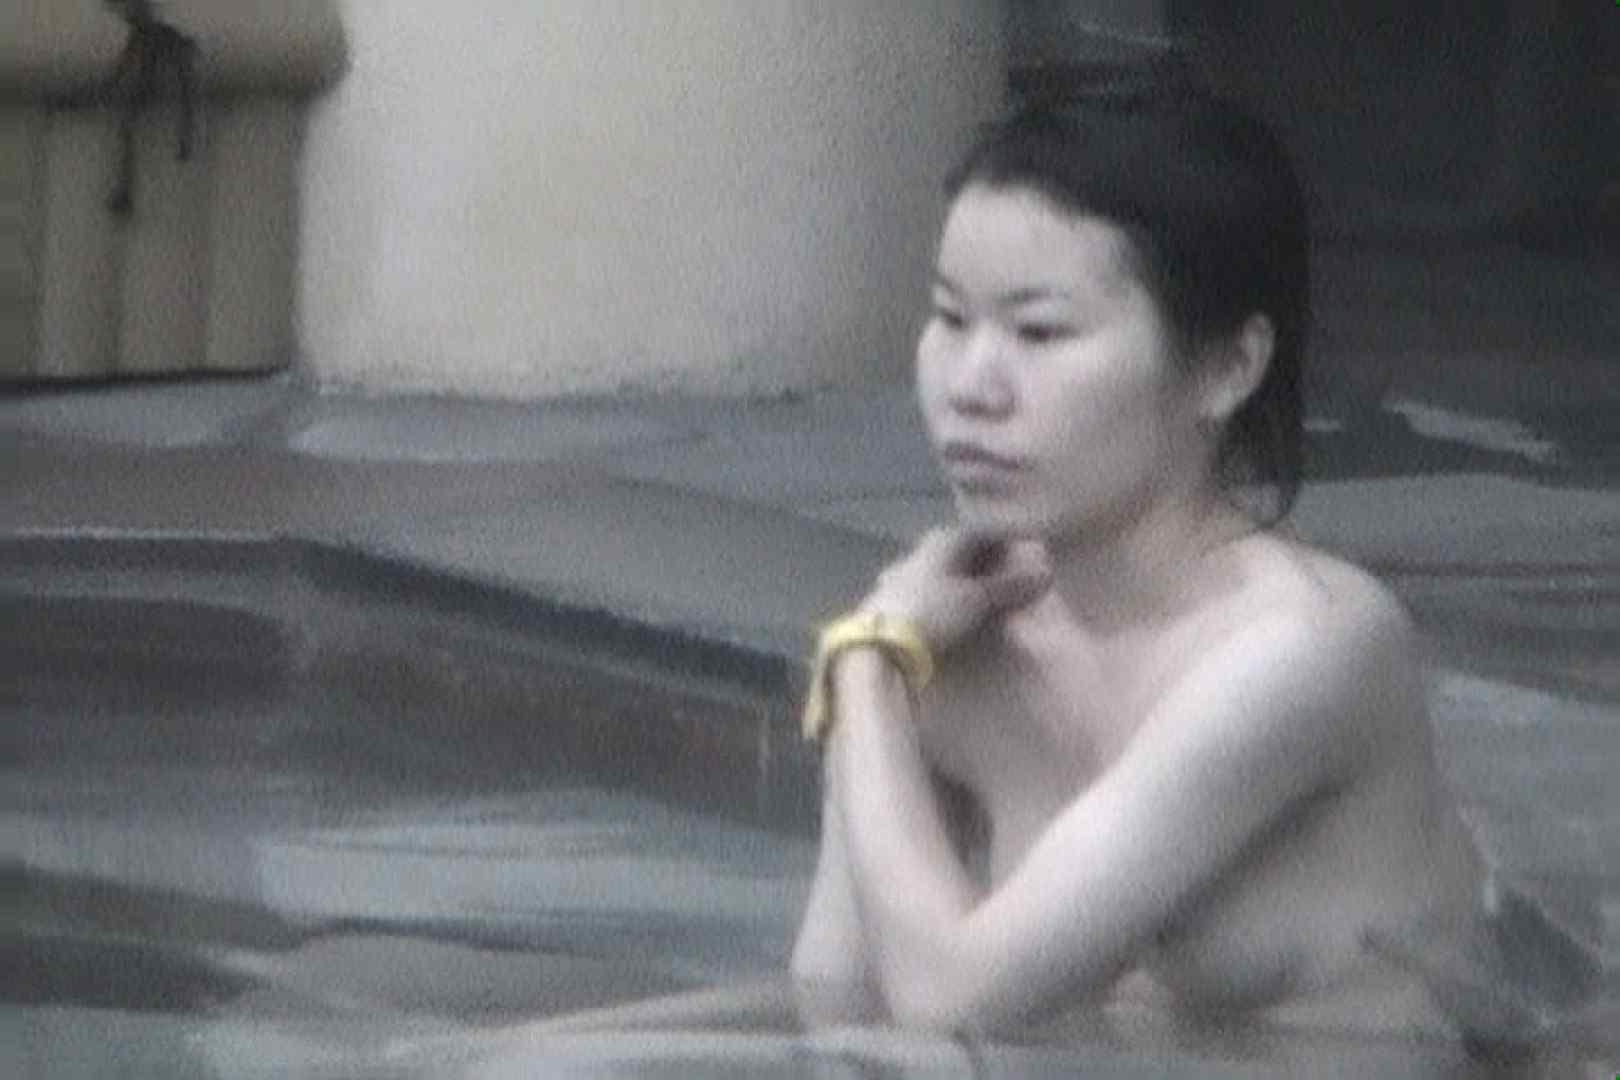 Aquaな露天風呂Vol.556 美しいOLの裸体 すけべAV動画紹介 69pic 41